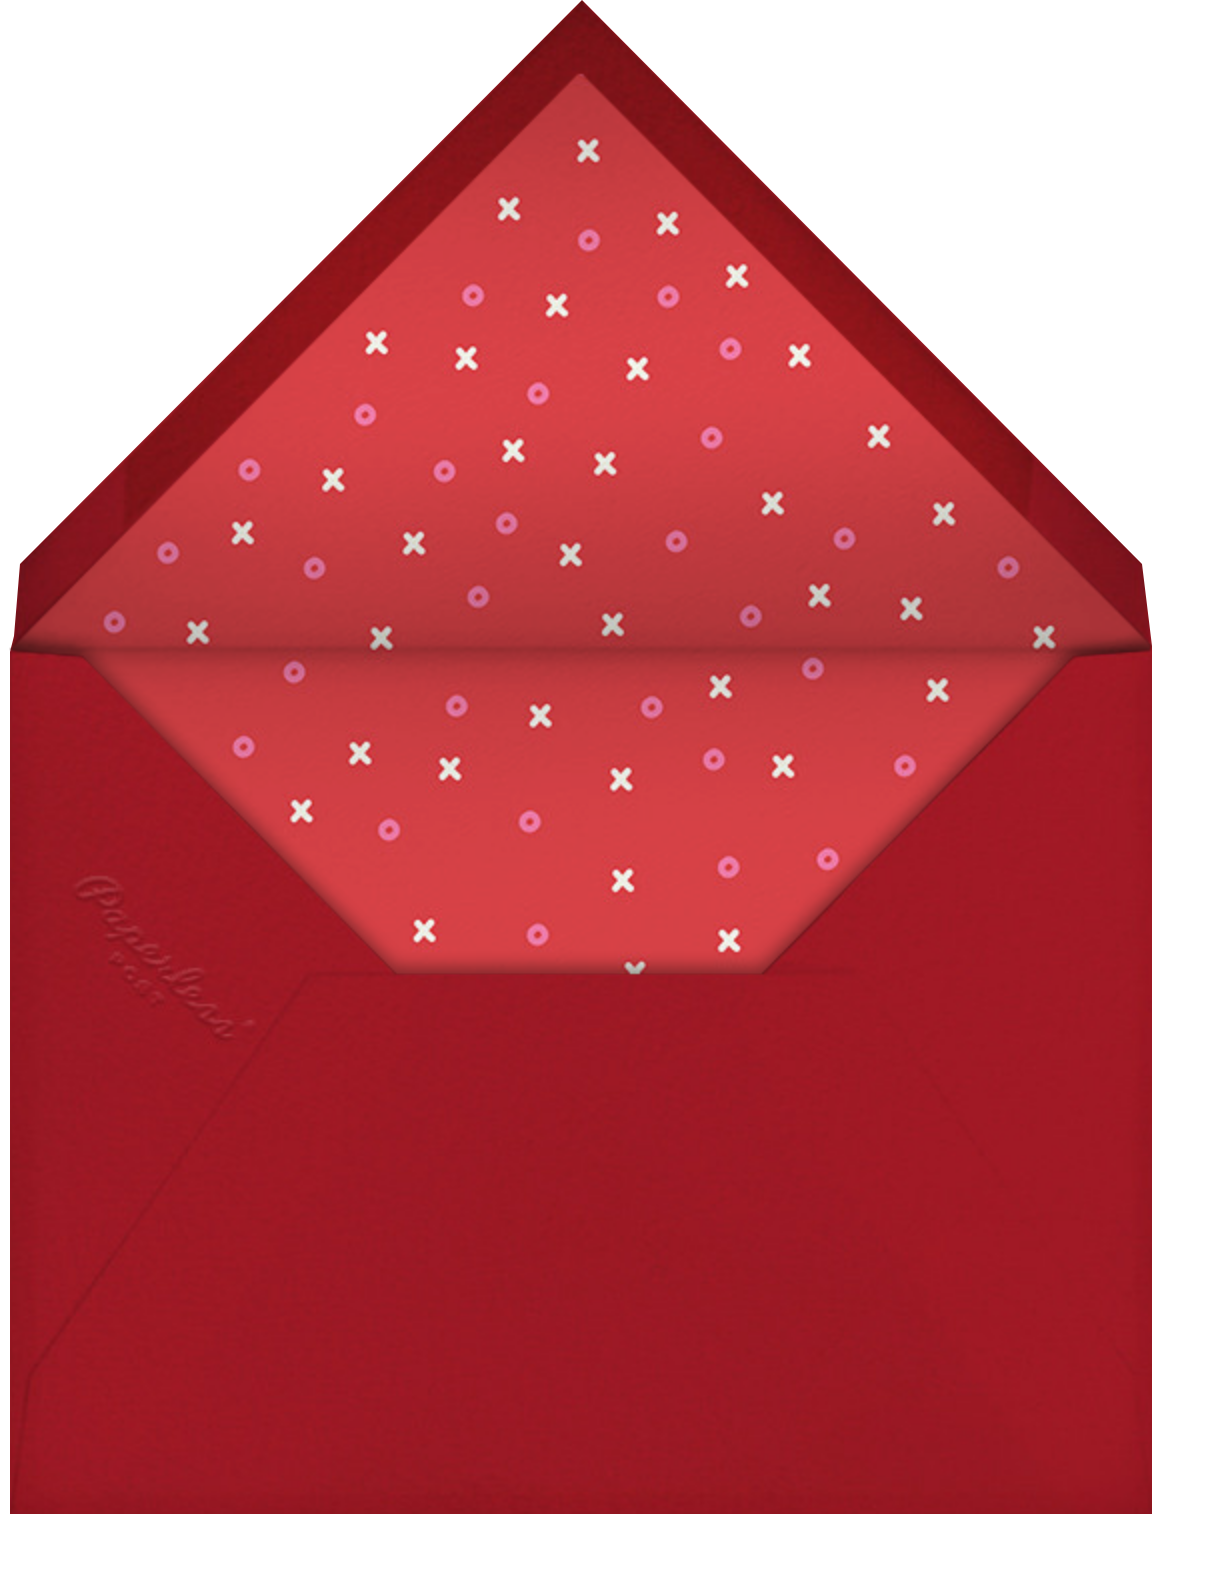 I - Kinda Like - You - Paperless Post - Envelope